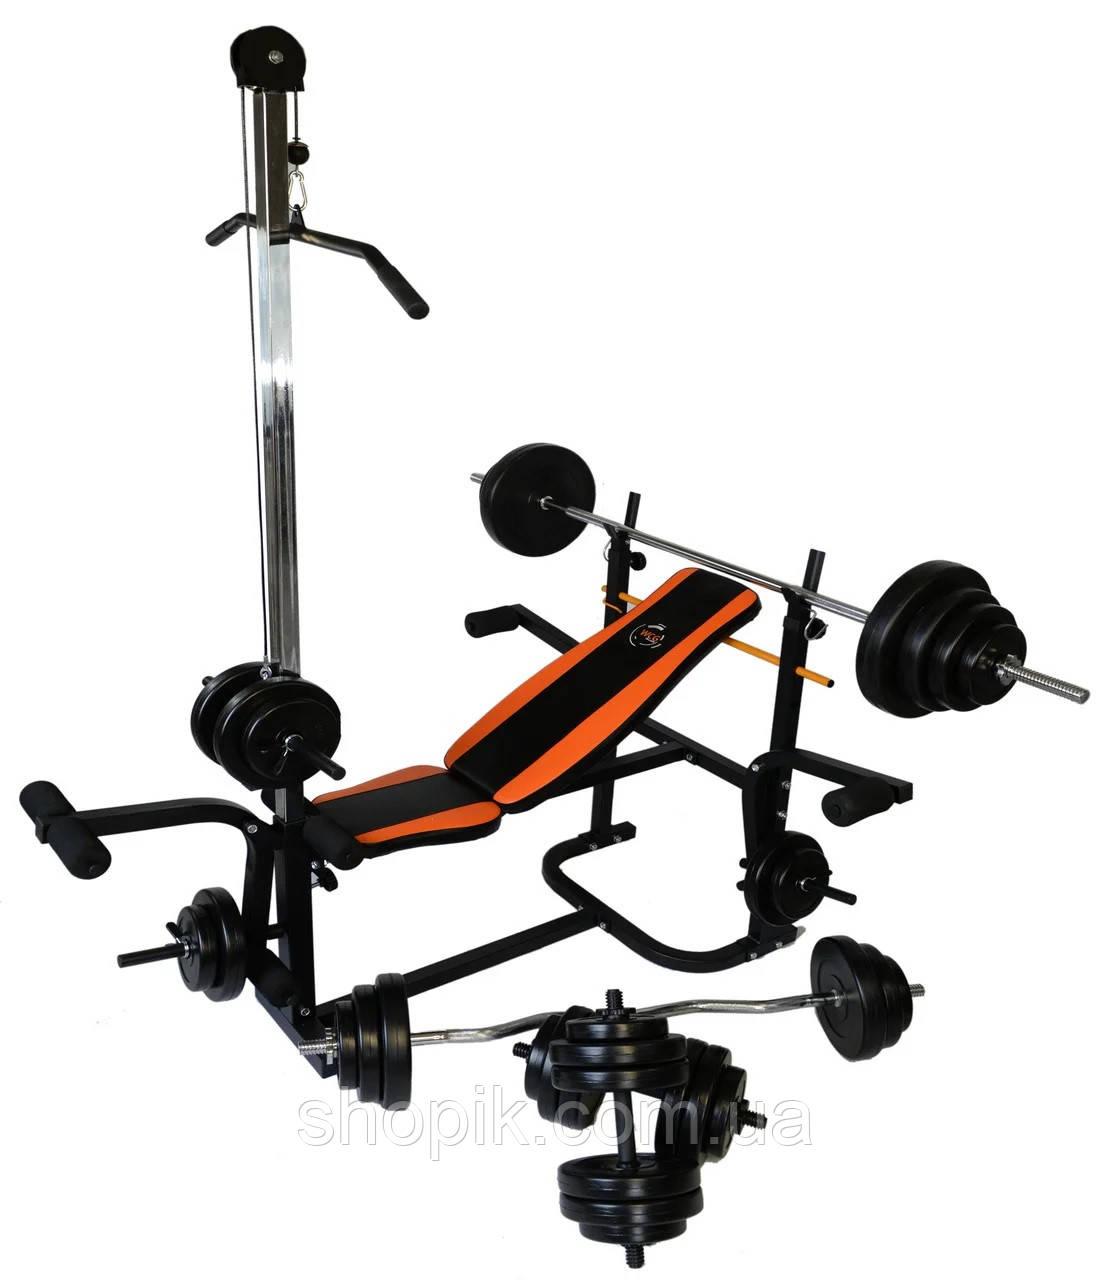 Лава тренувальна WCG 0070 + тяга, Скотта набір штанга 98 кг, Лавка з тягою, партою Скотта + набір 98 кг